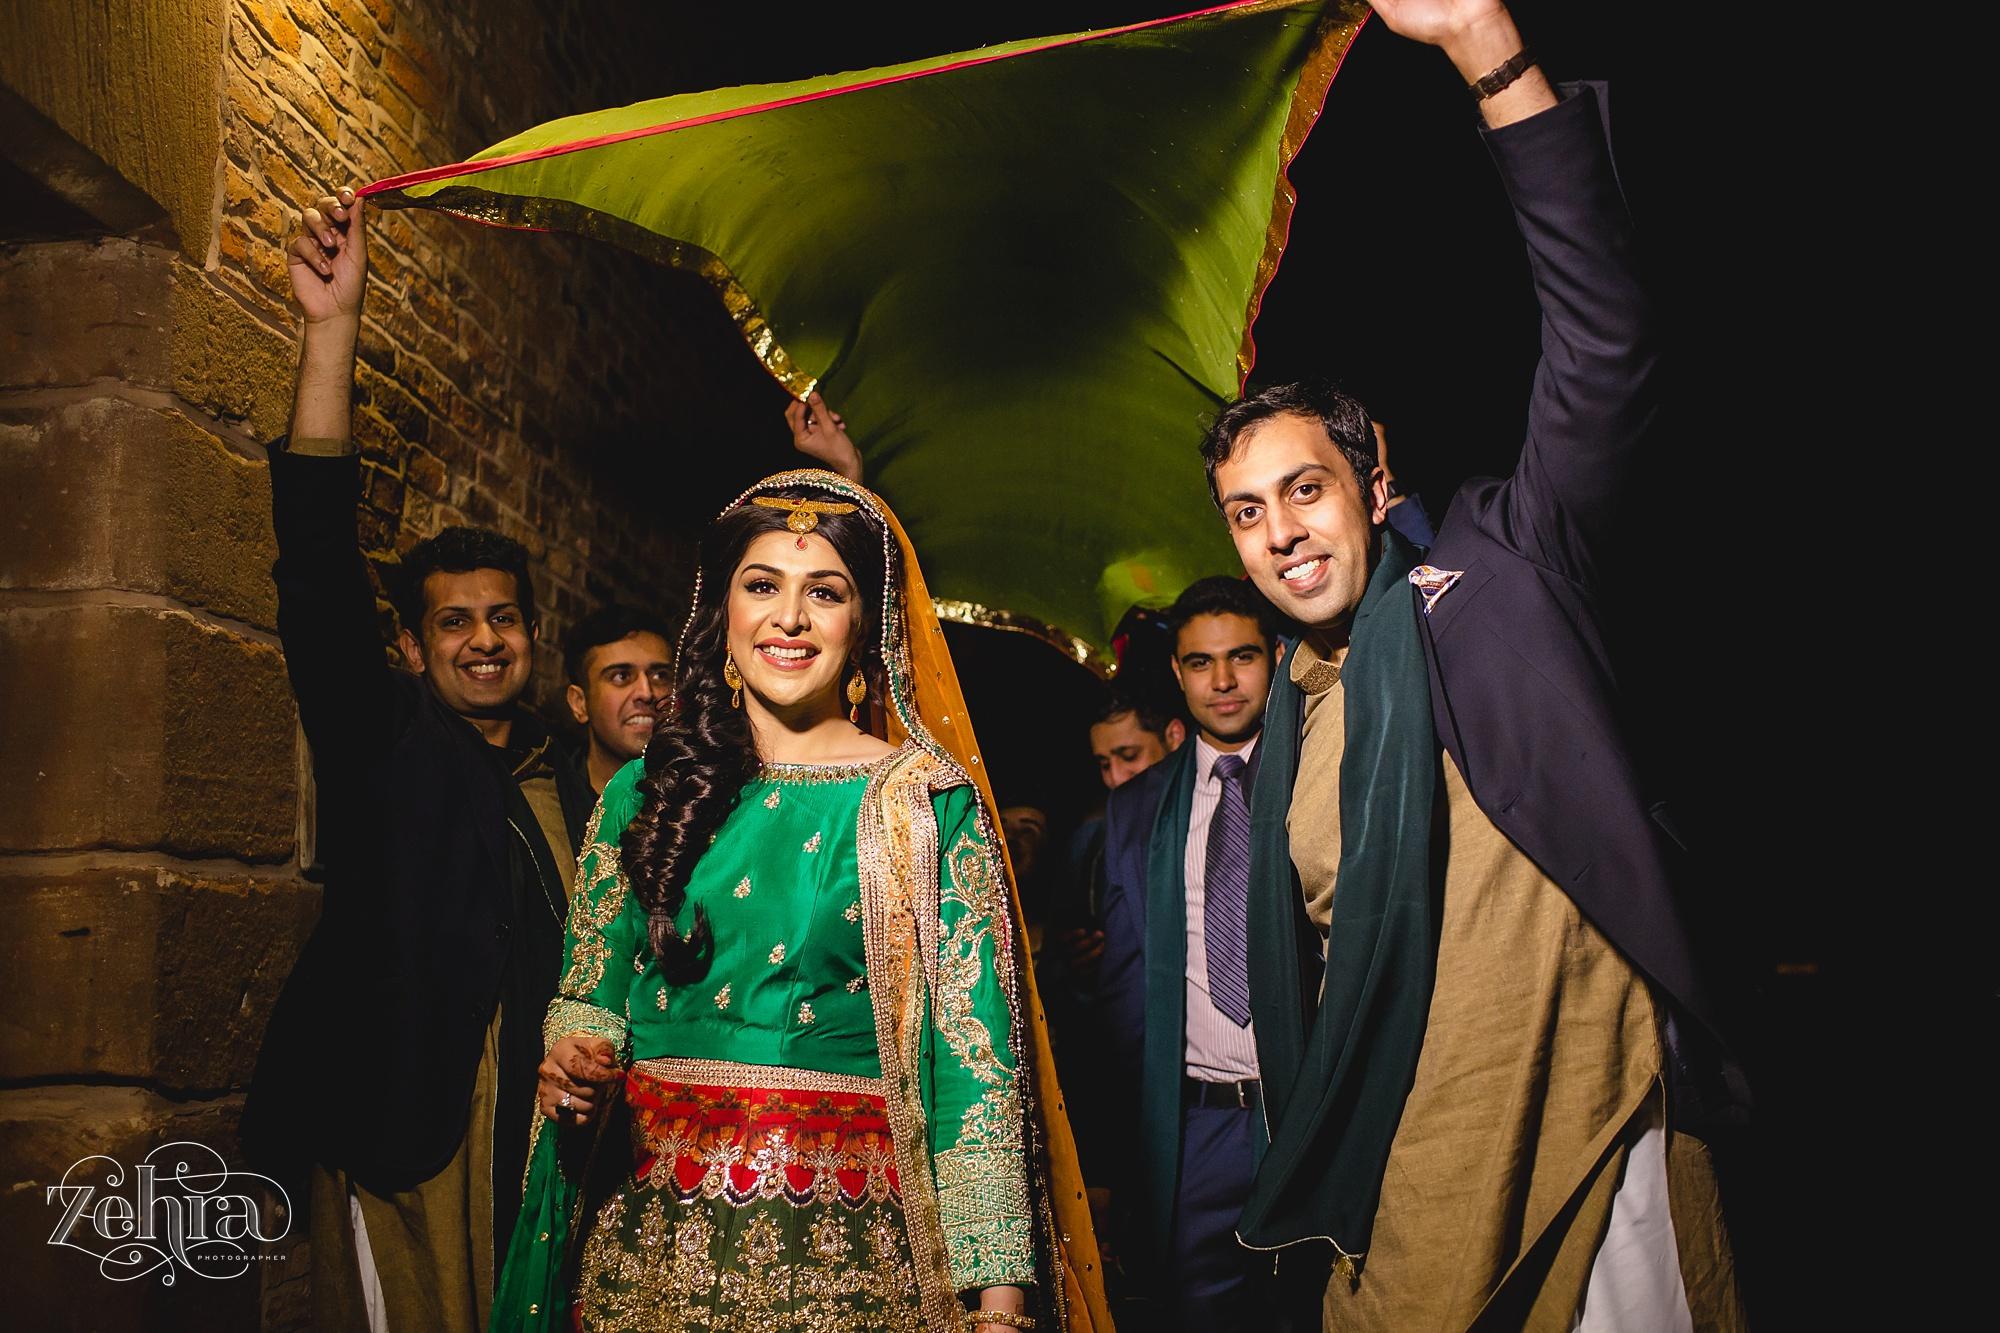 zehra wedding photographer arley hall cheshire027.jpg